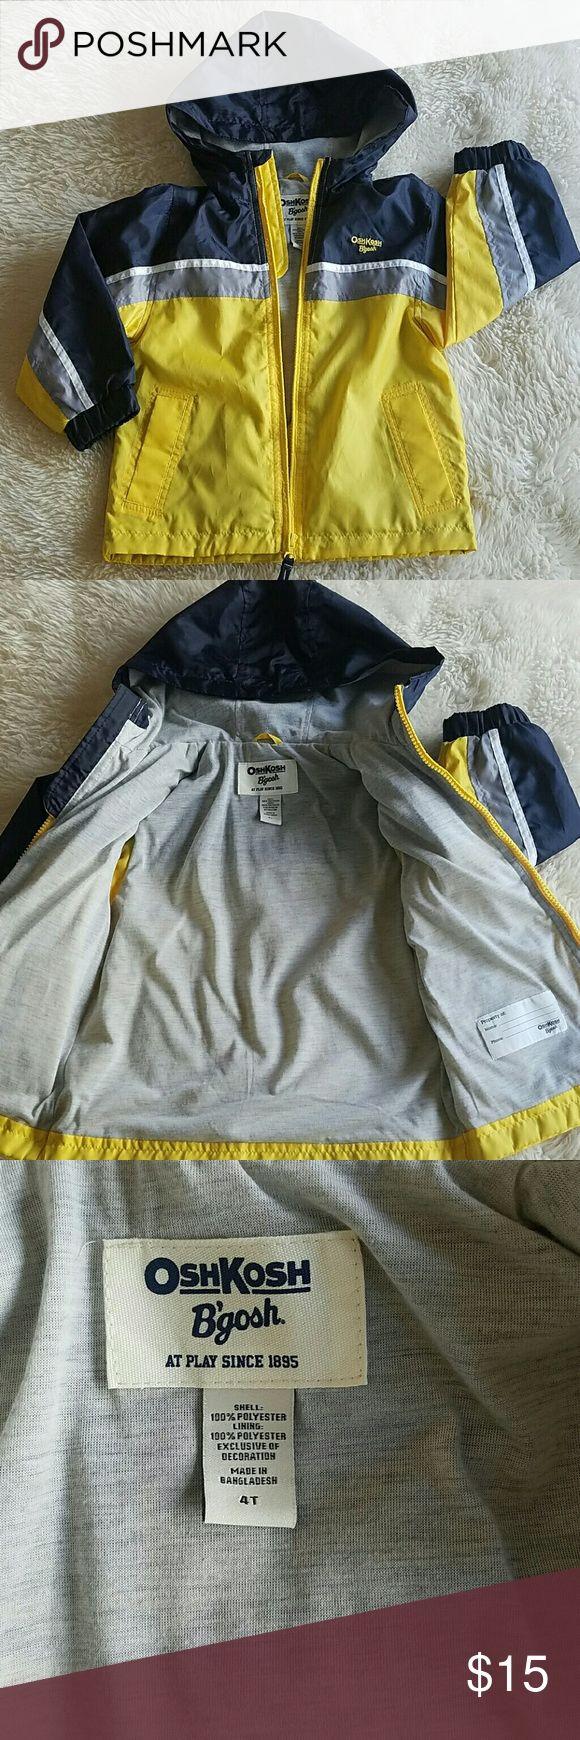 OshKosh raincoat for boys. Size 4T Great condition. Osh Kosh Jackets & Coats Raincoats